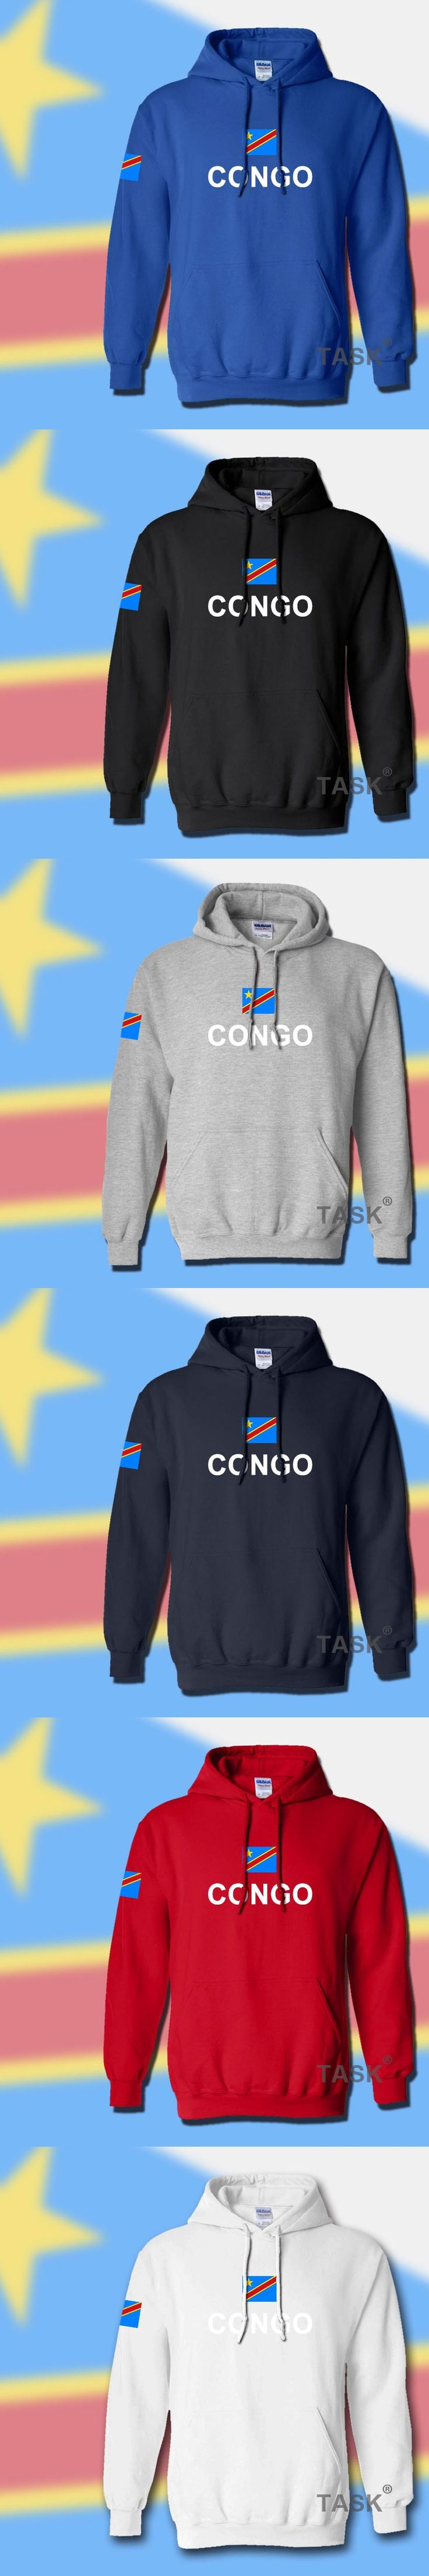 DR Congo hoodies men sweatshirt sweat new hip hop streetwear footballer sporting tracksuit COD DRC DROC Congo-Kinsha Congolese